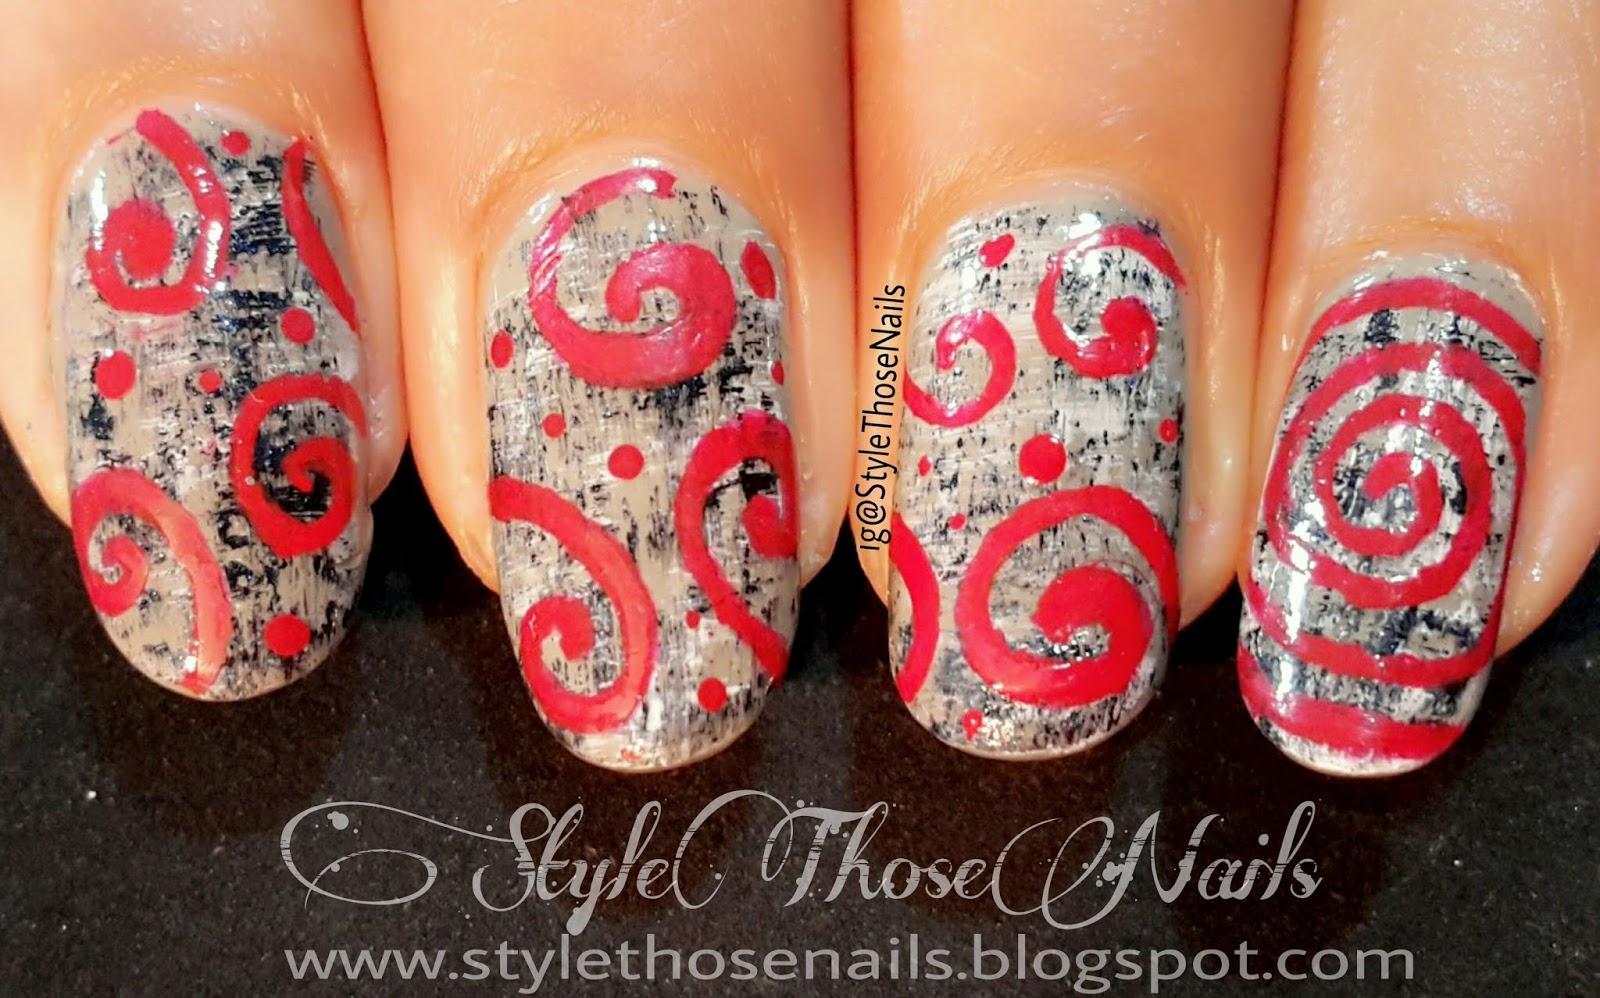 Style Those Nails Textured Tweed Swirls Nailart Fall Nail Design